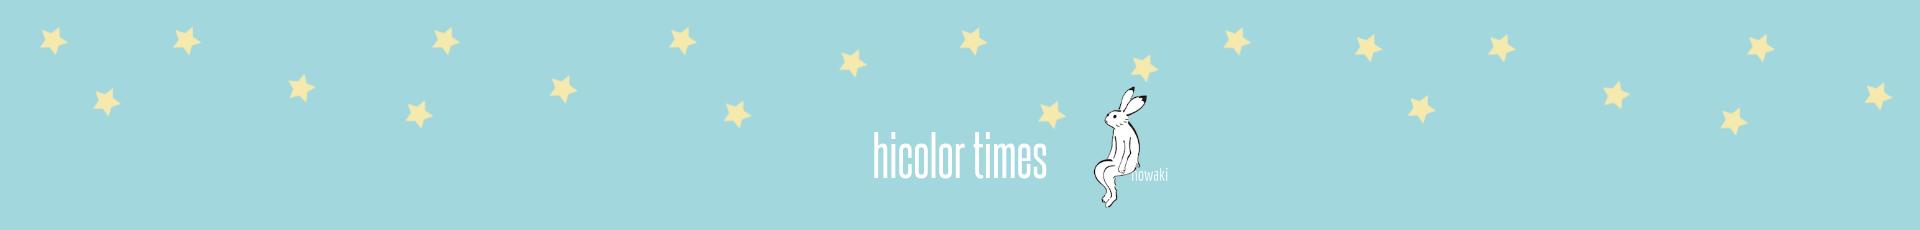 hicolor times